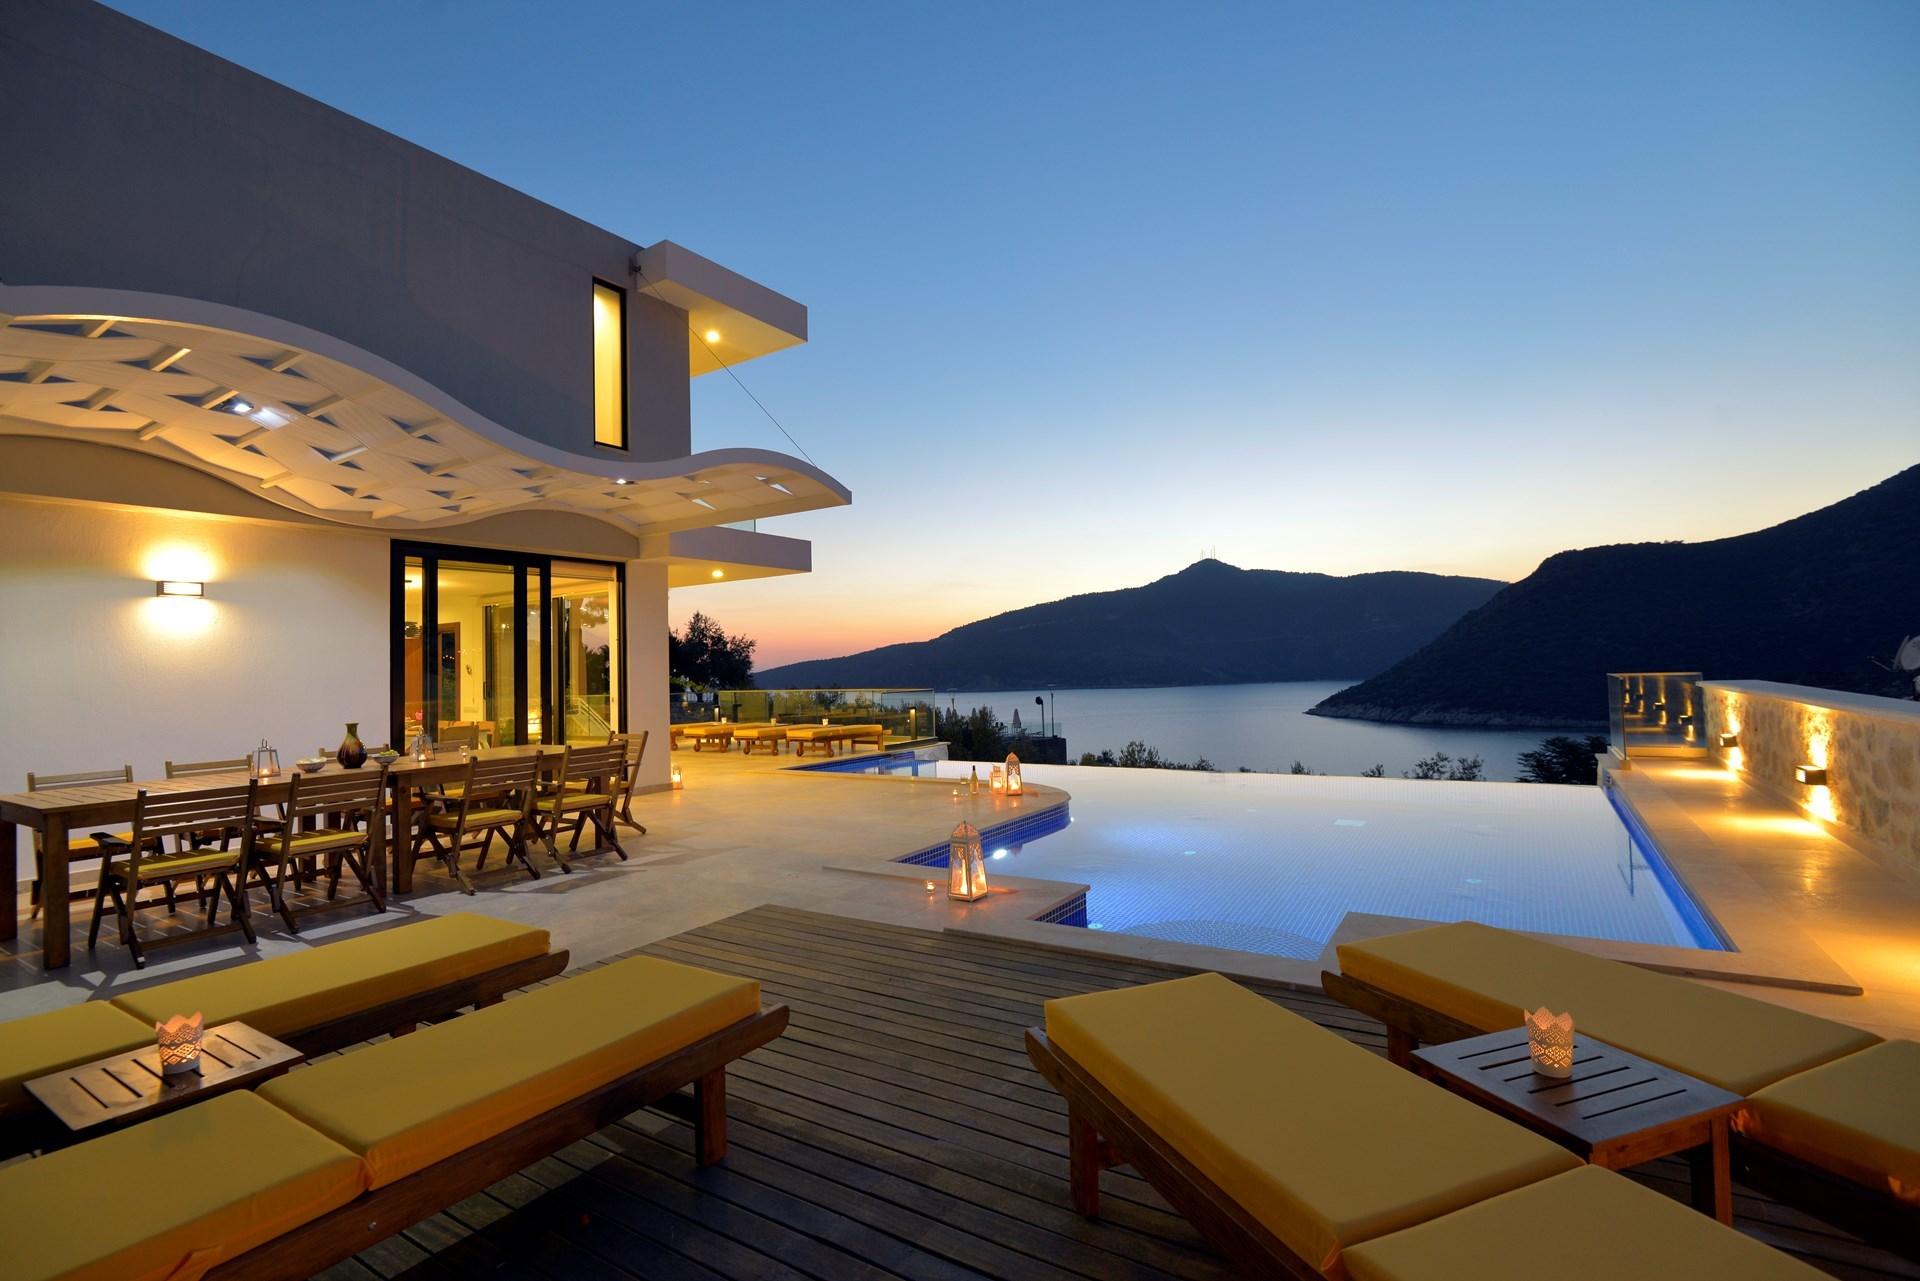 Villa_Kalamar,_Kalkan_Kas_and_Islamlar,_Turkey.jpg